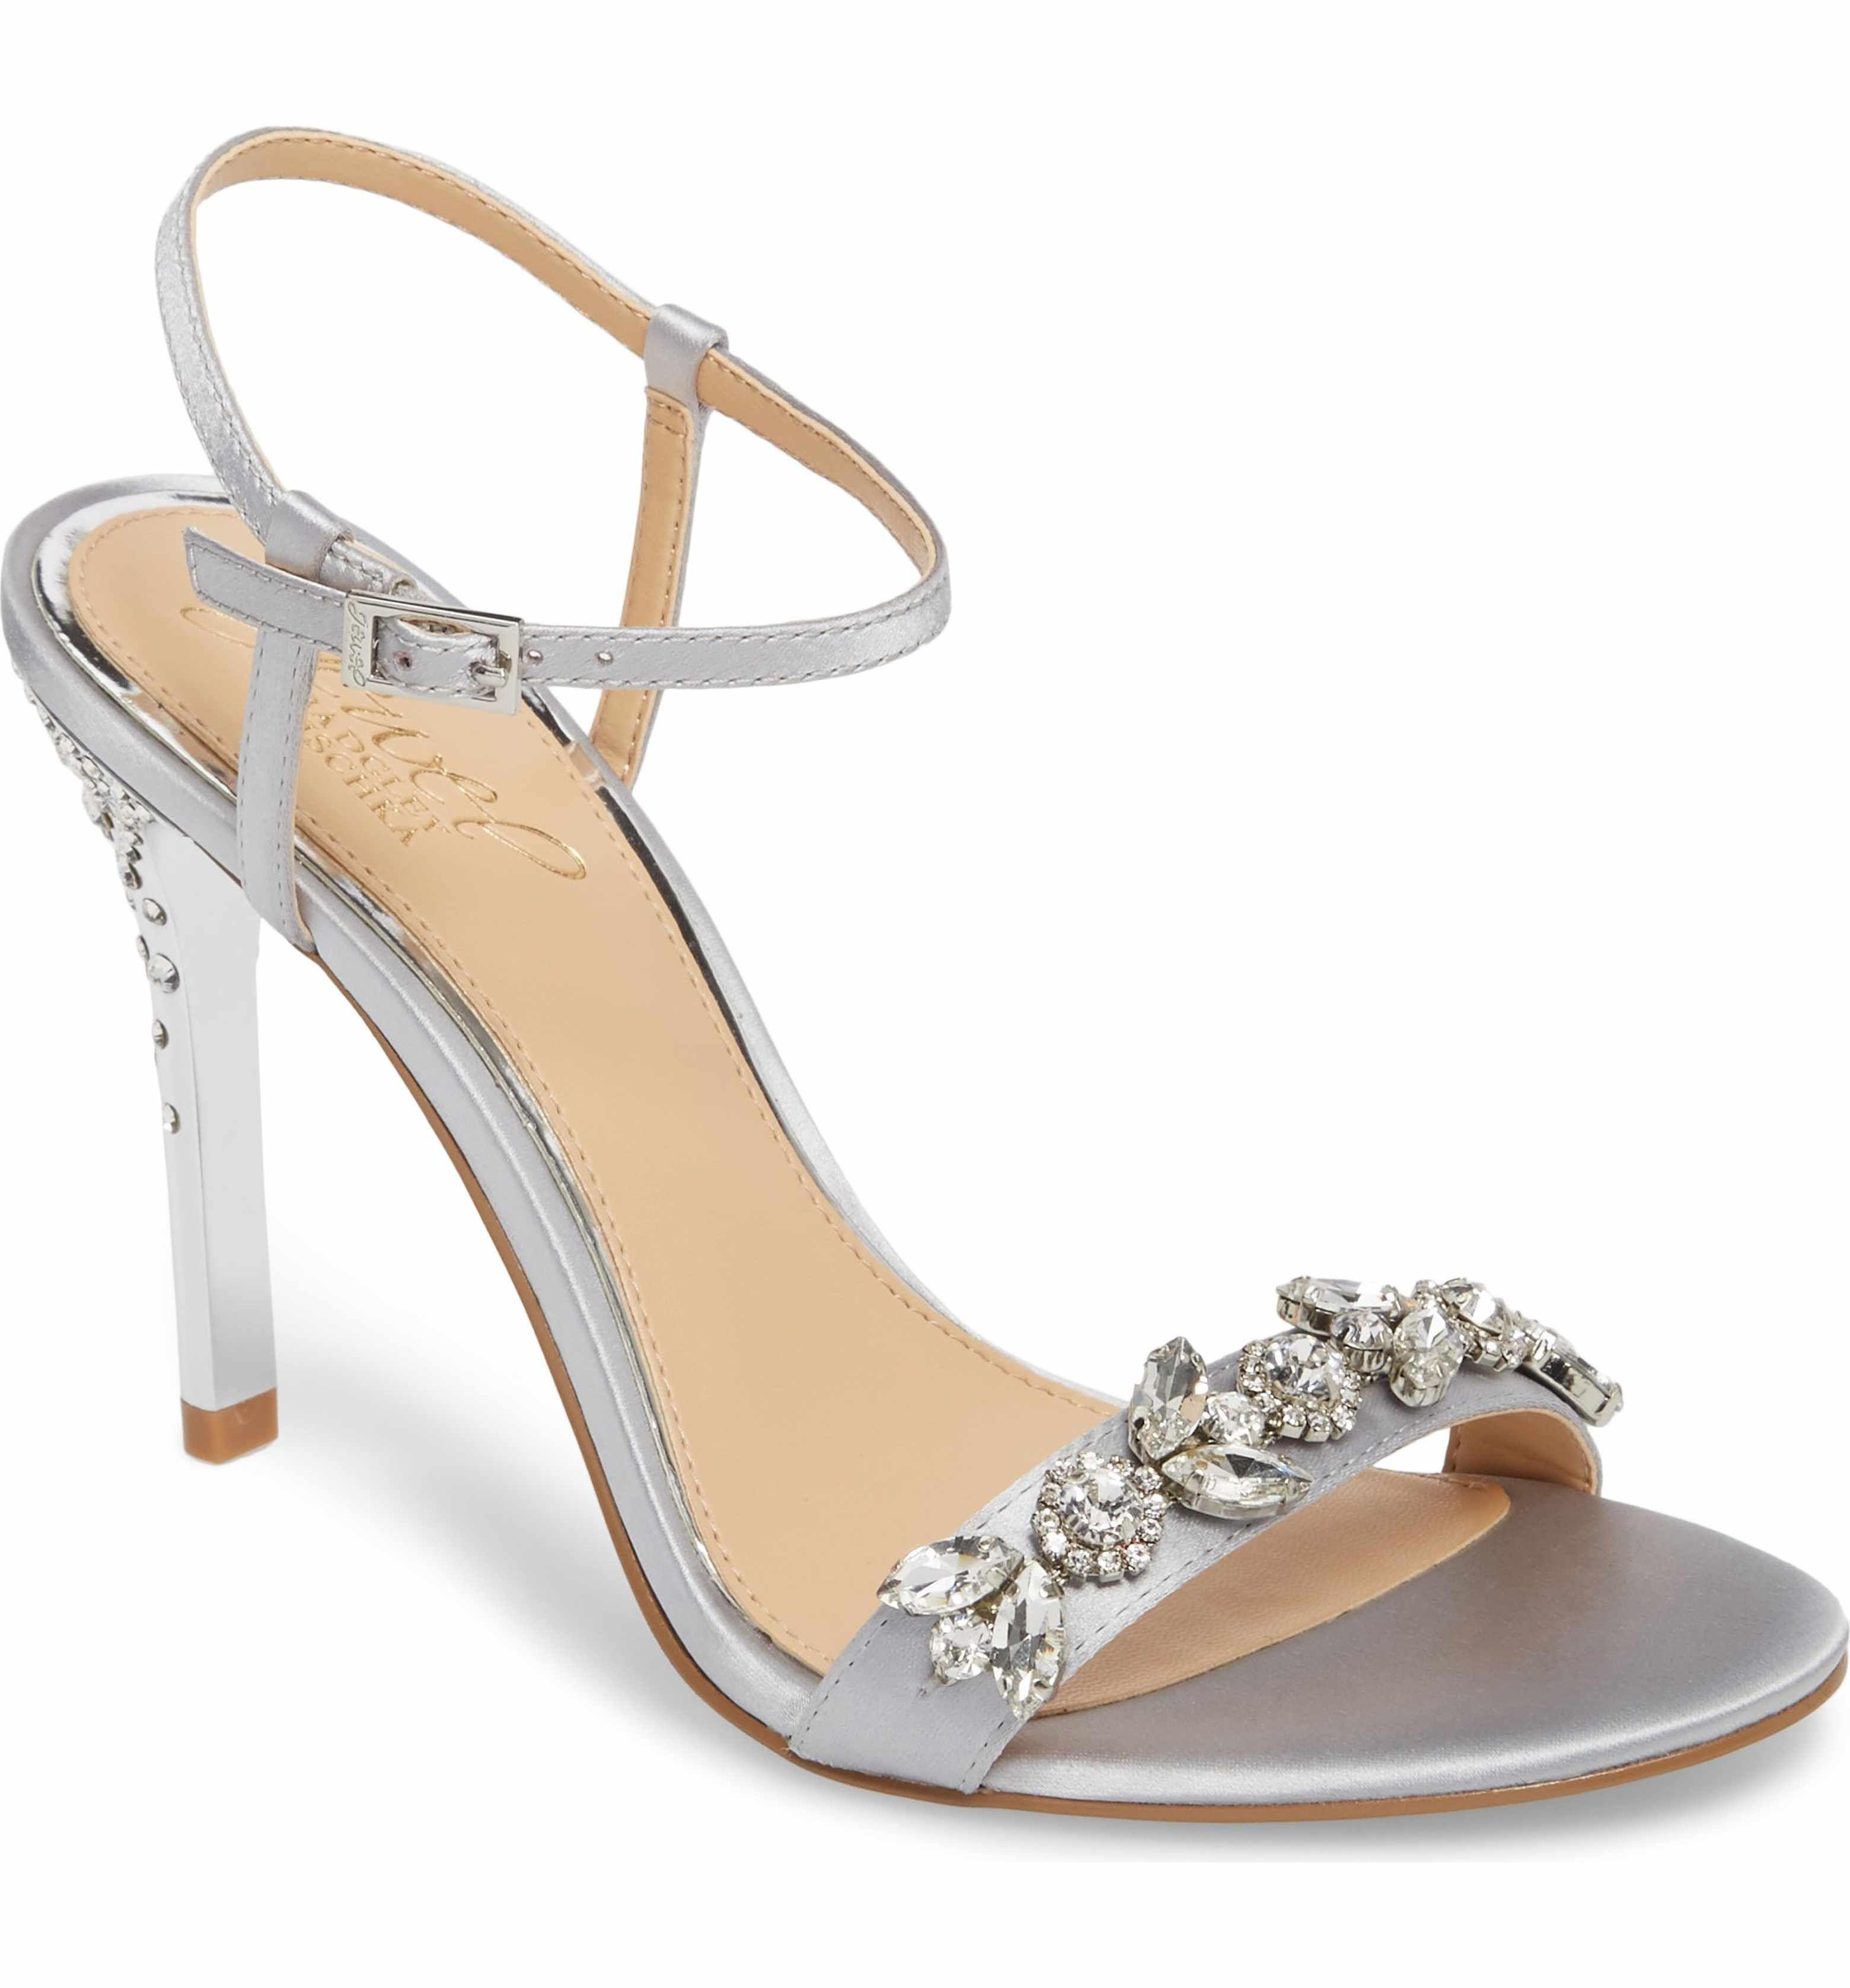 194a4a681db7 Main Image - Jewel Badgley Mischka Tex Ankle Strap Sandal (Women ...